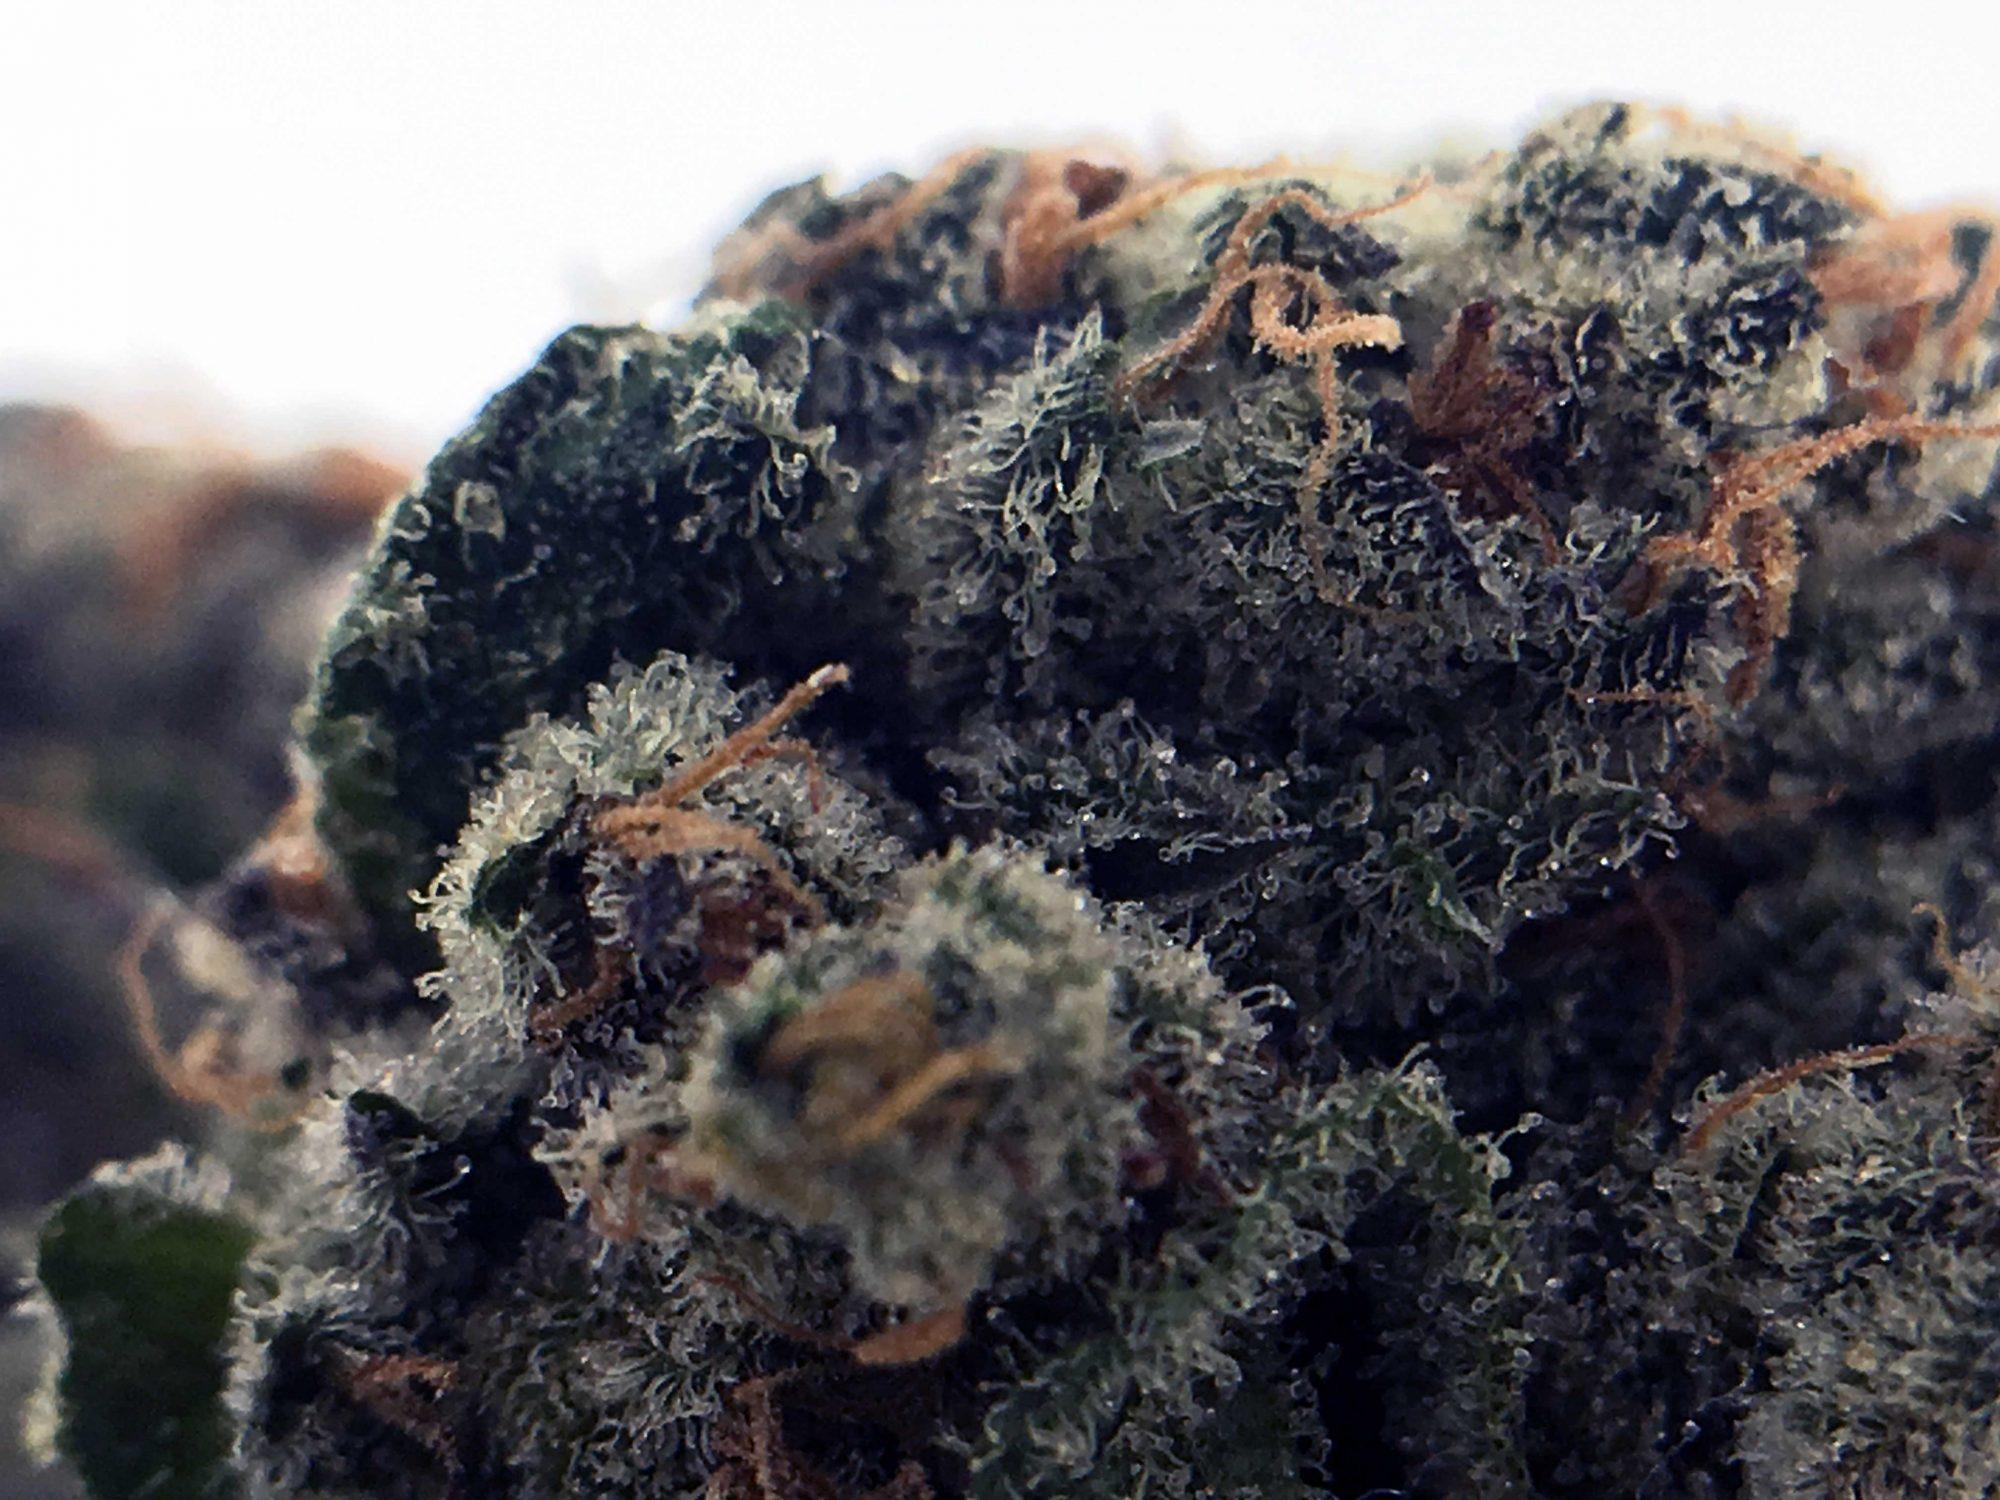 Sour Power OG, Sour Power OG Cannabis Strain Information & Review